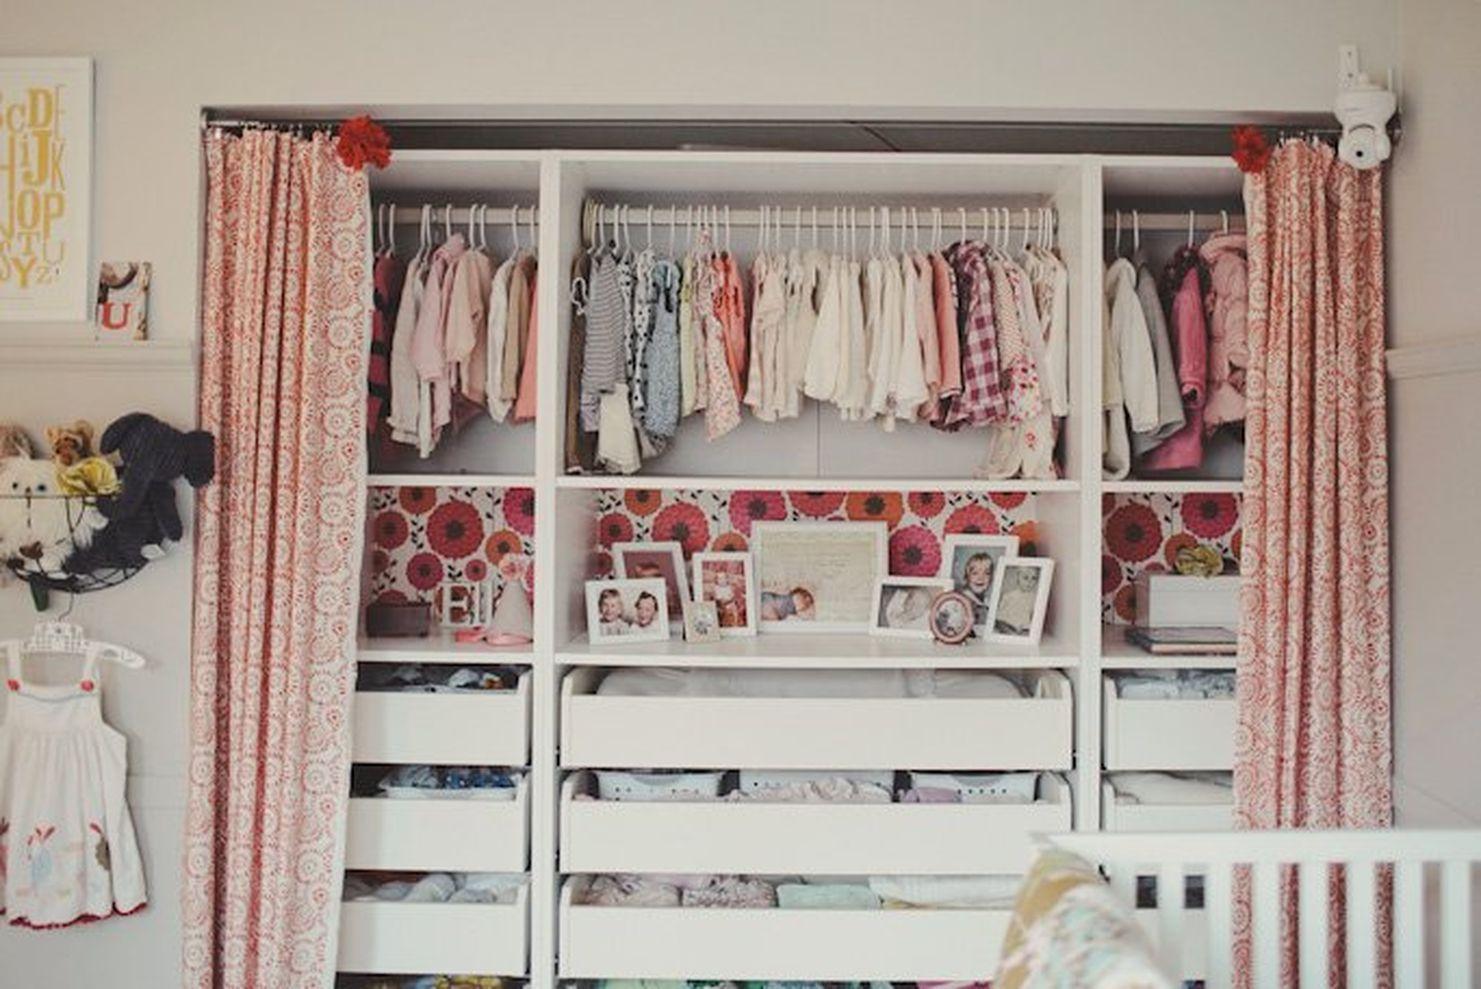 85 Cool and Amazing DIY Closet Door Curtains Ideas Closet door